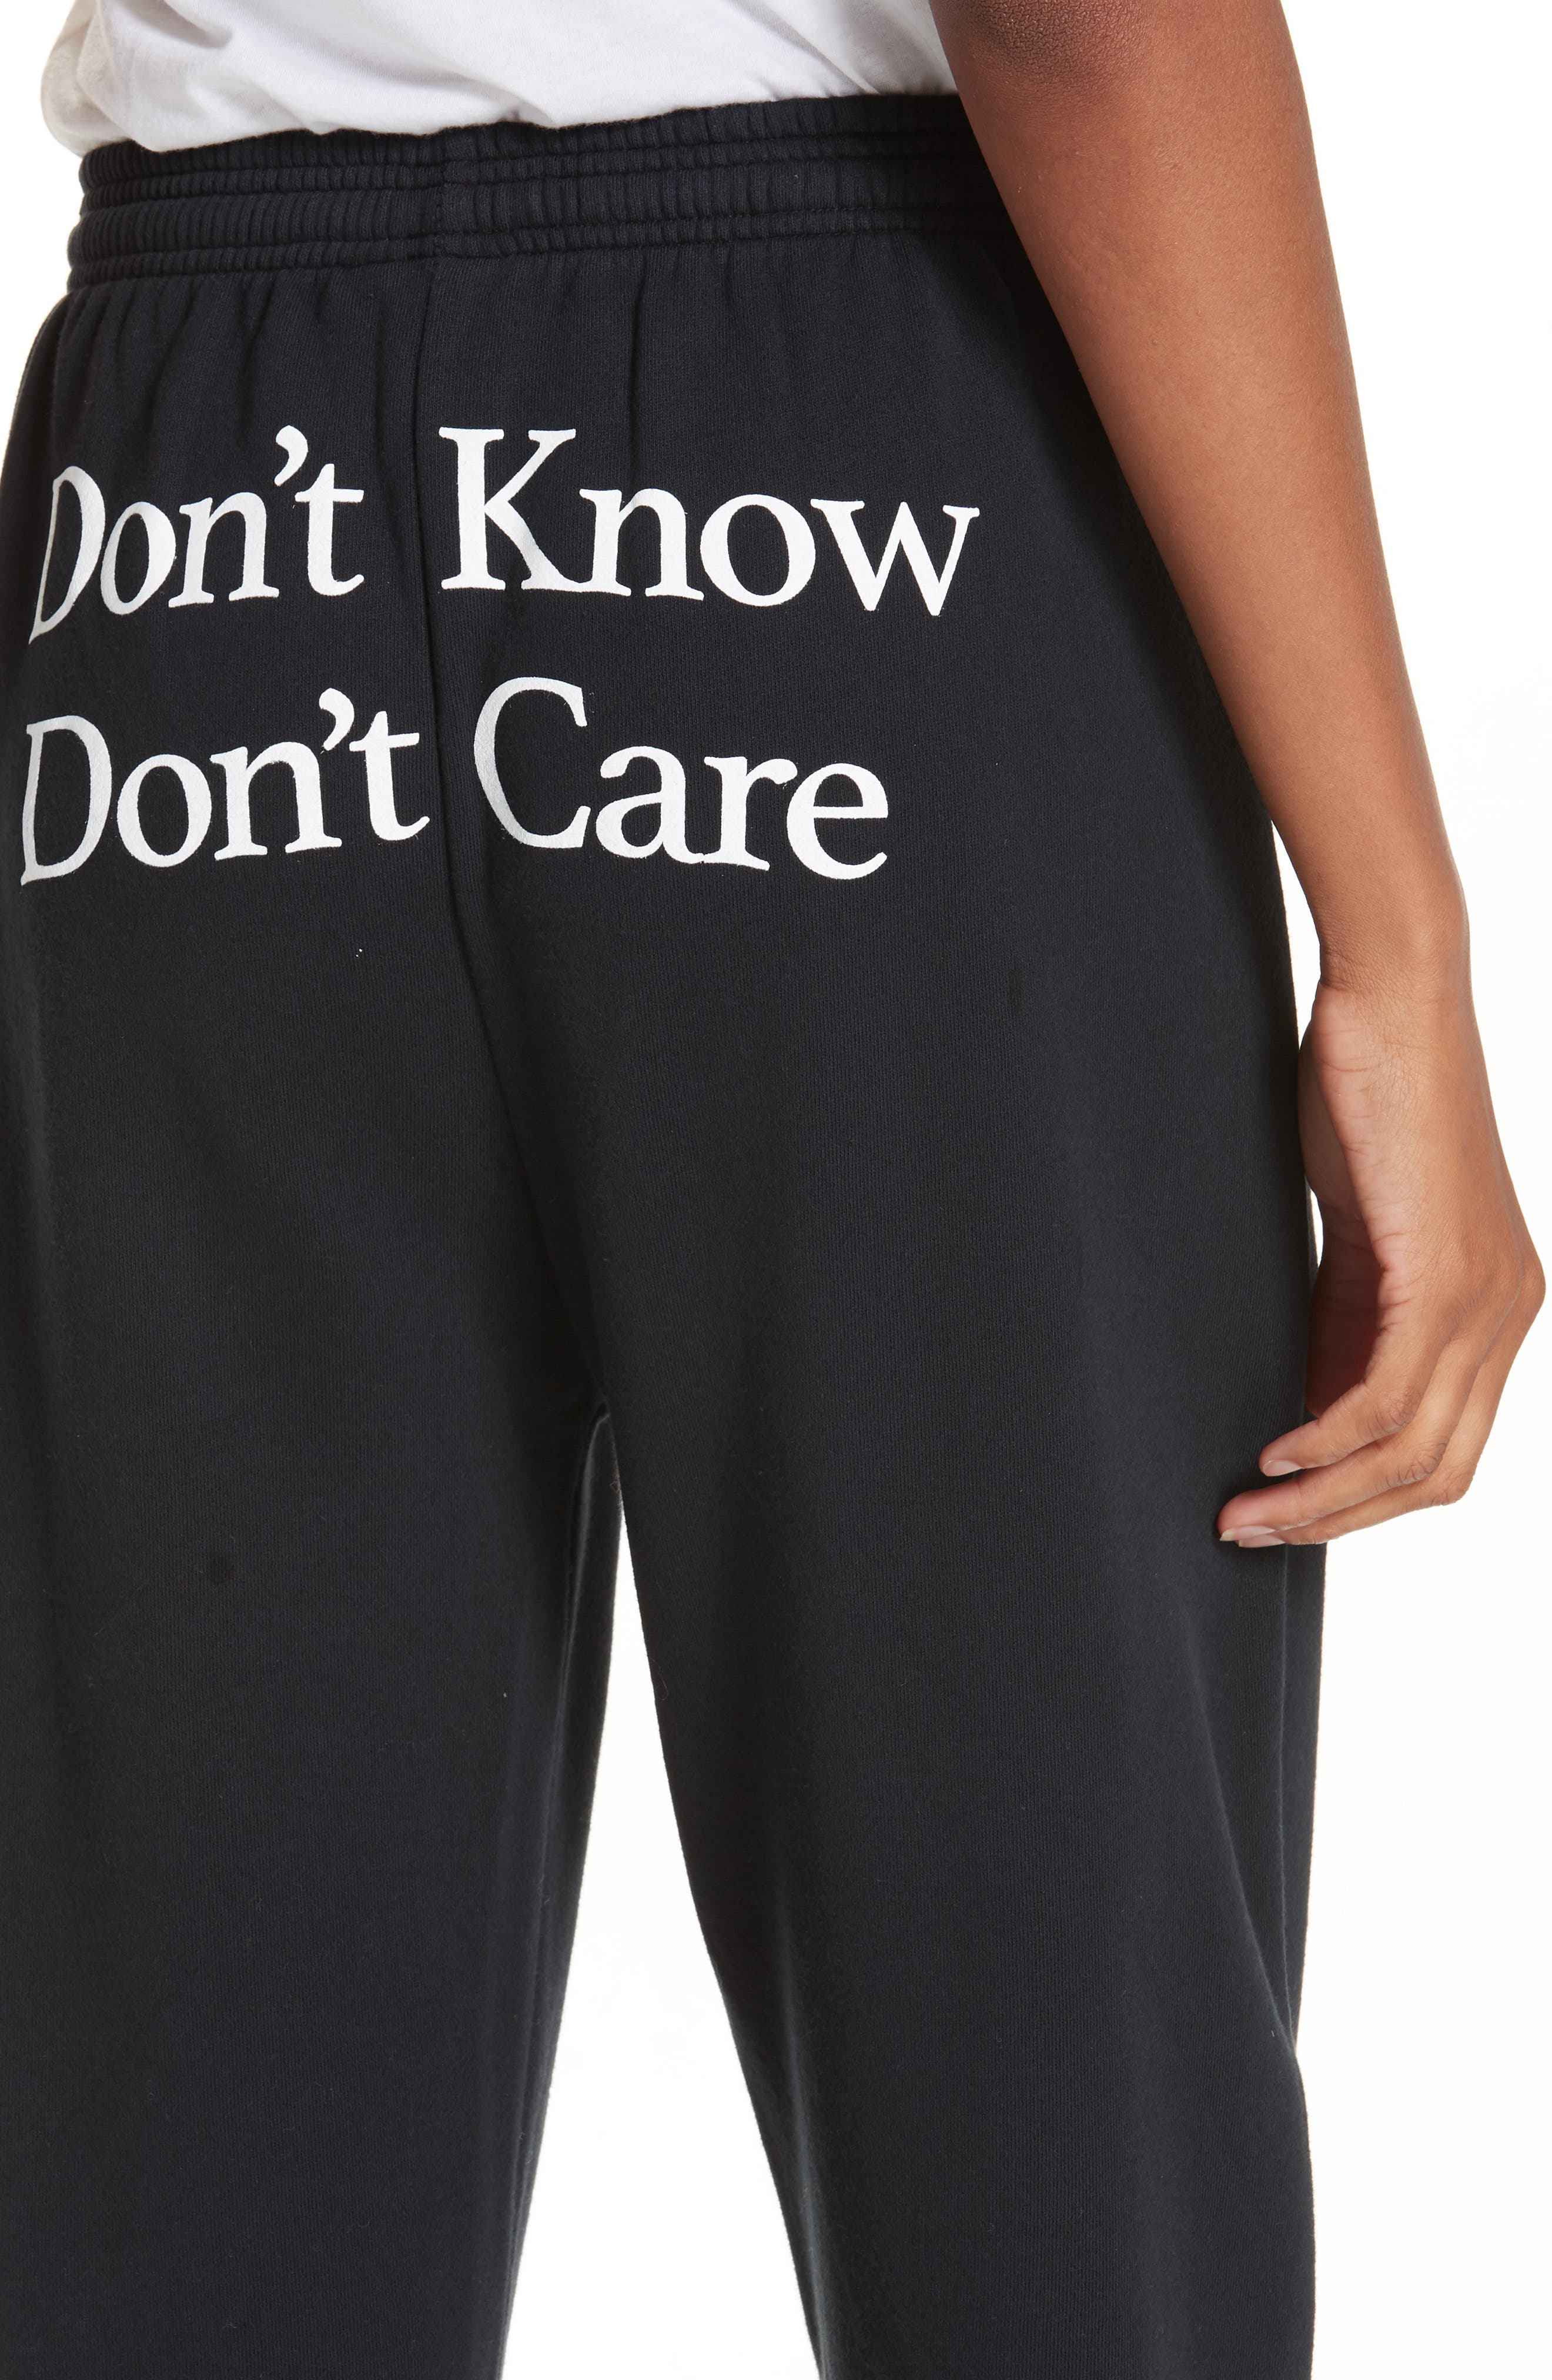 Don't Know Don't Care Jogger Pants,                             Alternate thumbnail 4, color,                             001